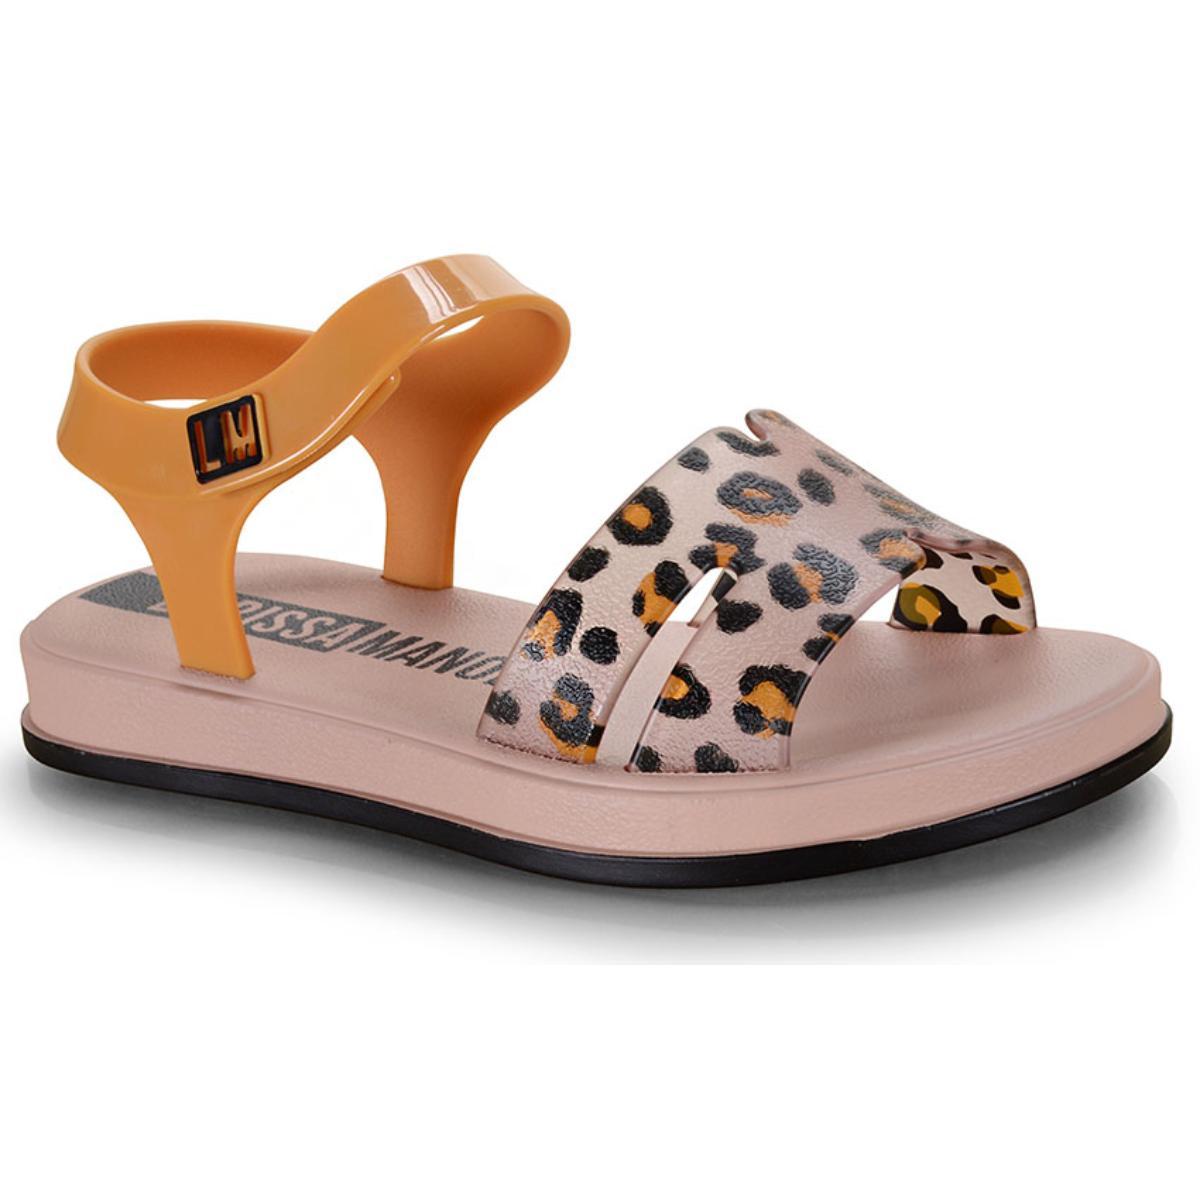 Sandália Fem Infantil Grendene 22156 25117 Larissa Manoela Vip Flat Rosa/preto/amarelo